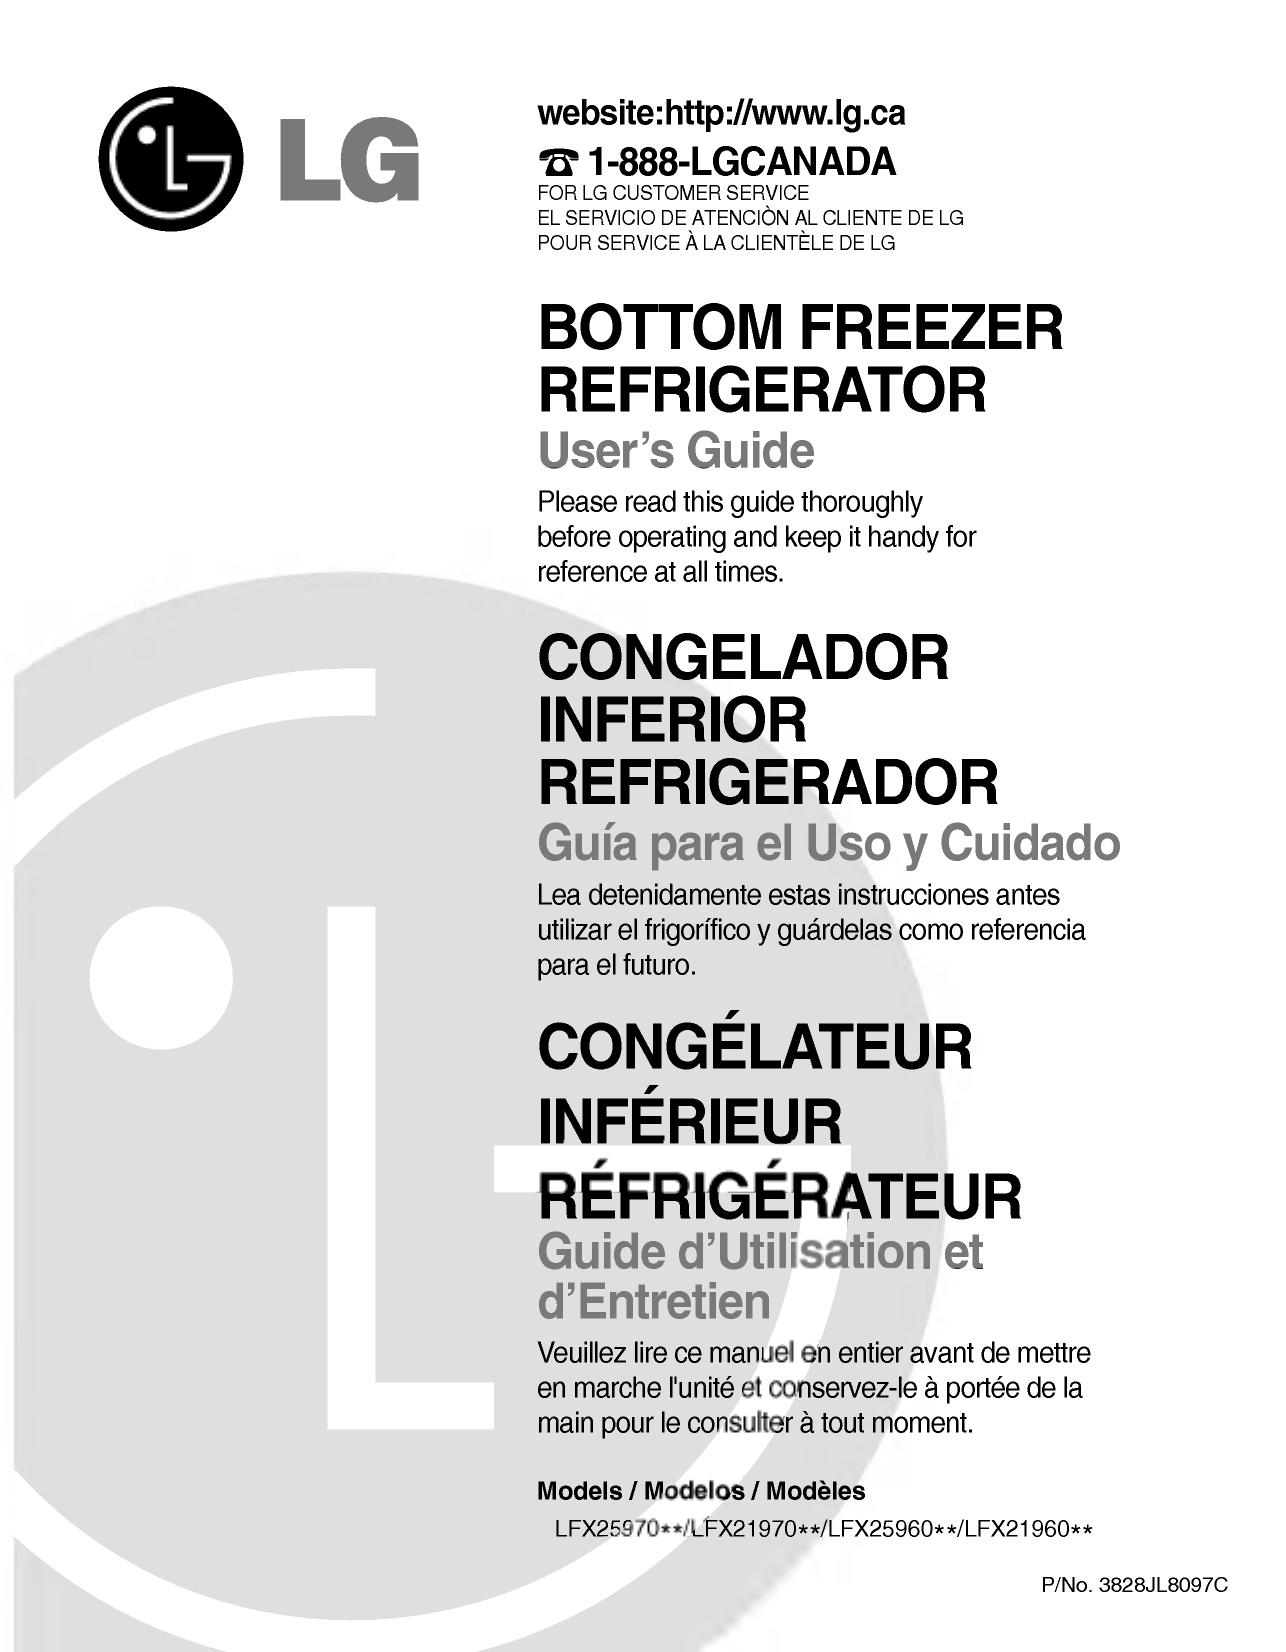 LG LFX25960ST Owner's Manual | Manualzzmanualzz